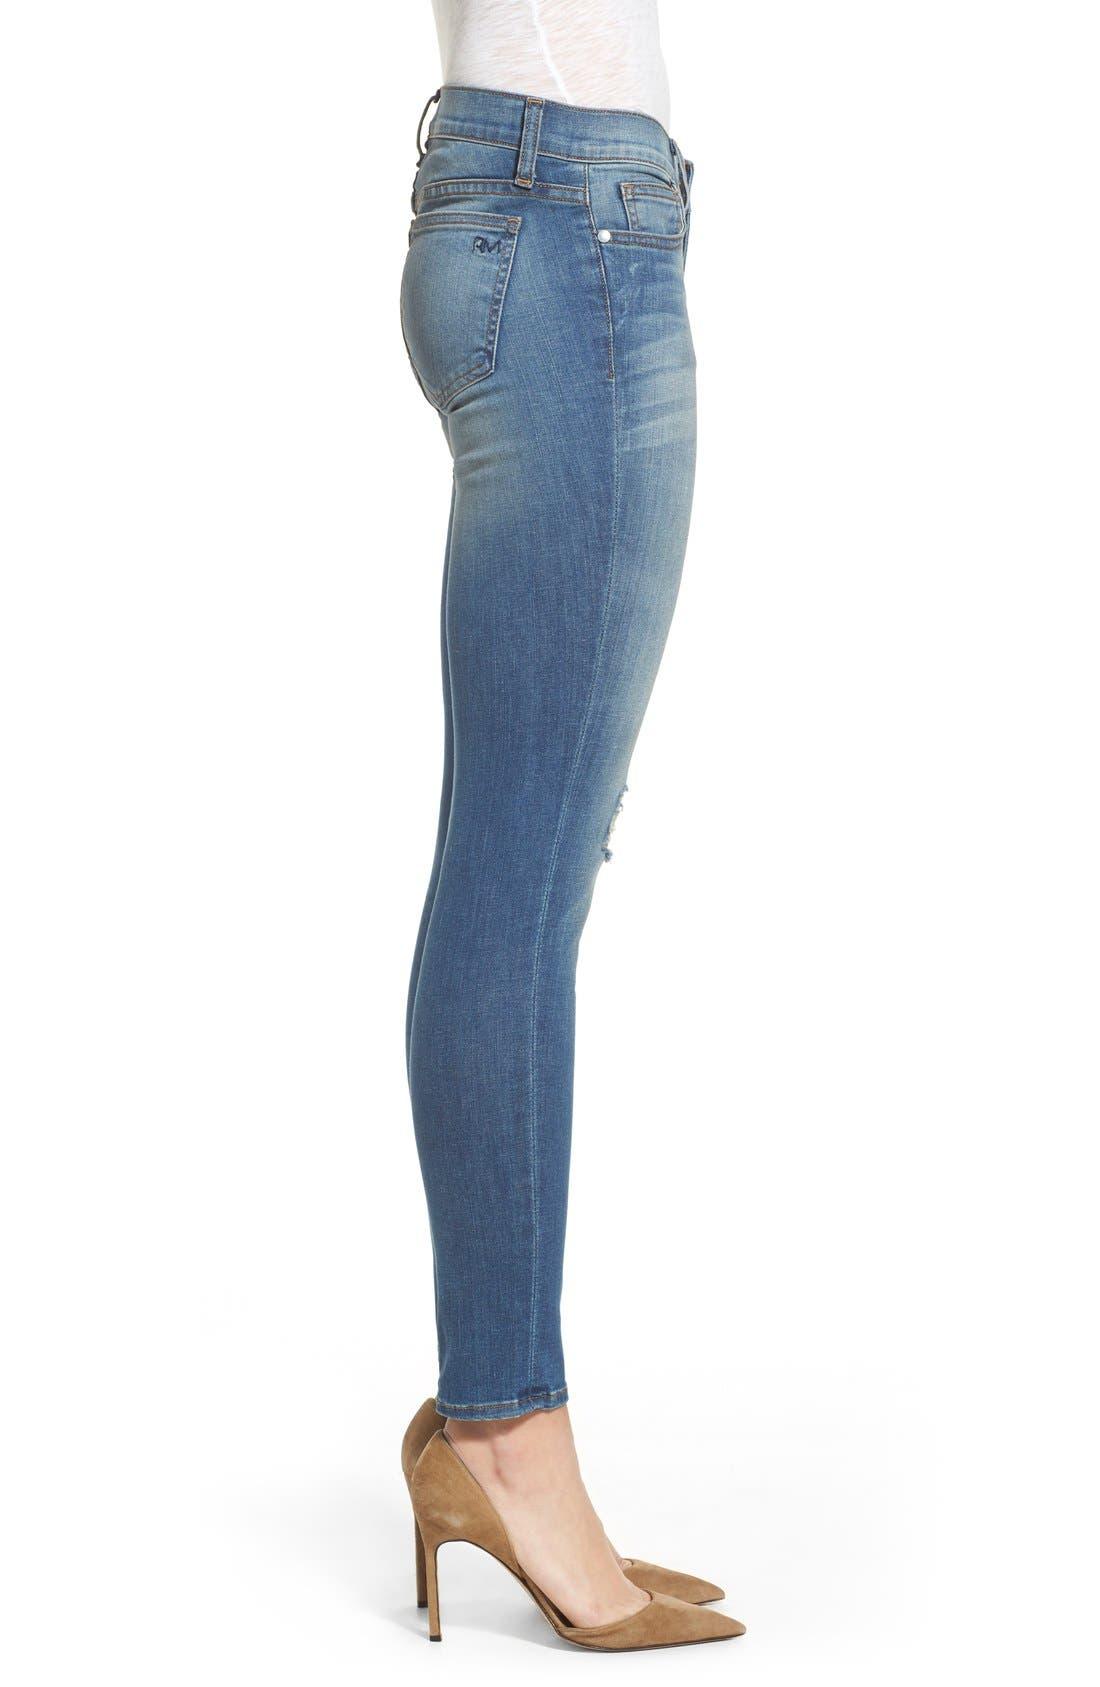 REBECCA MINKOFF, 'Jane' Skinny Jeans, Alternate thumbnail 3, color, 400